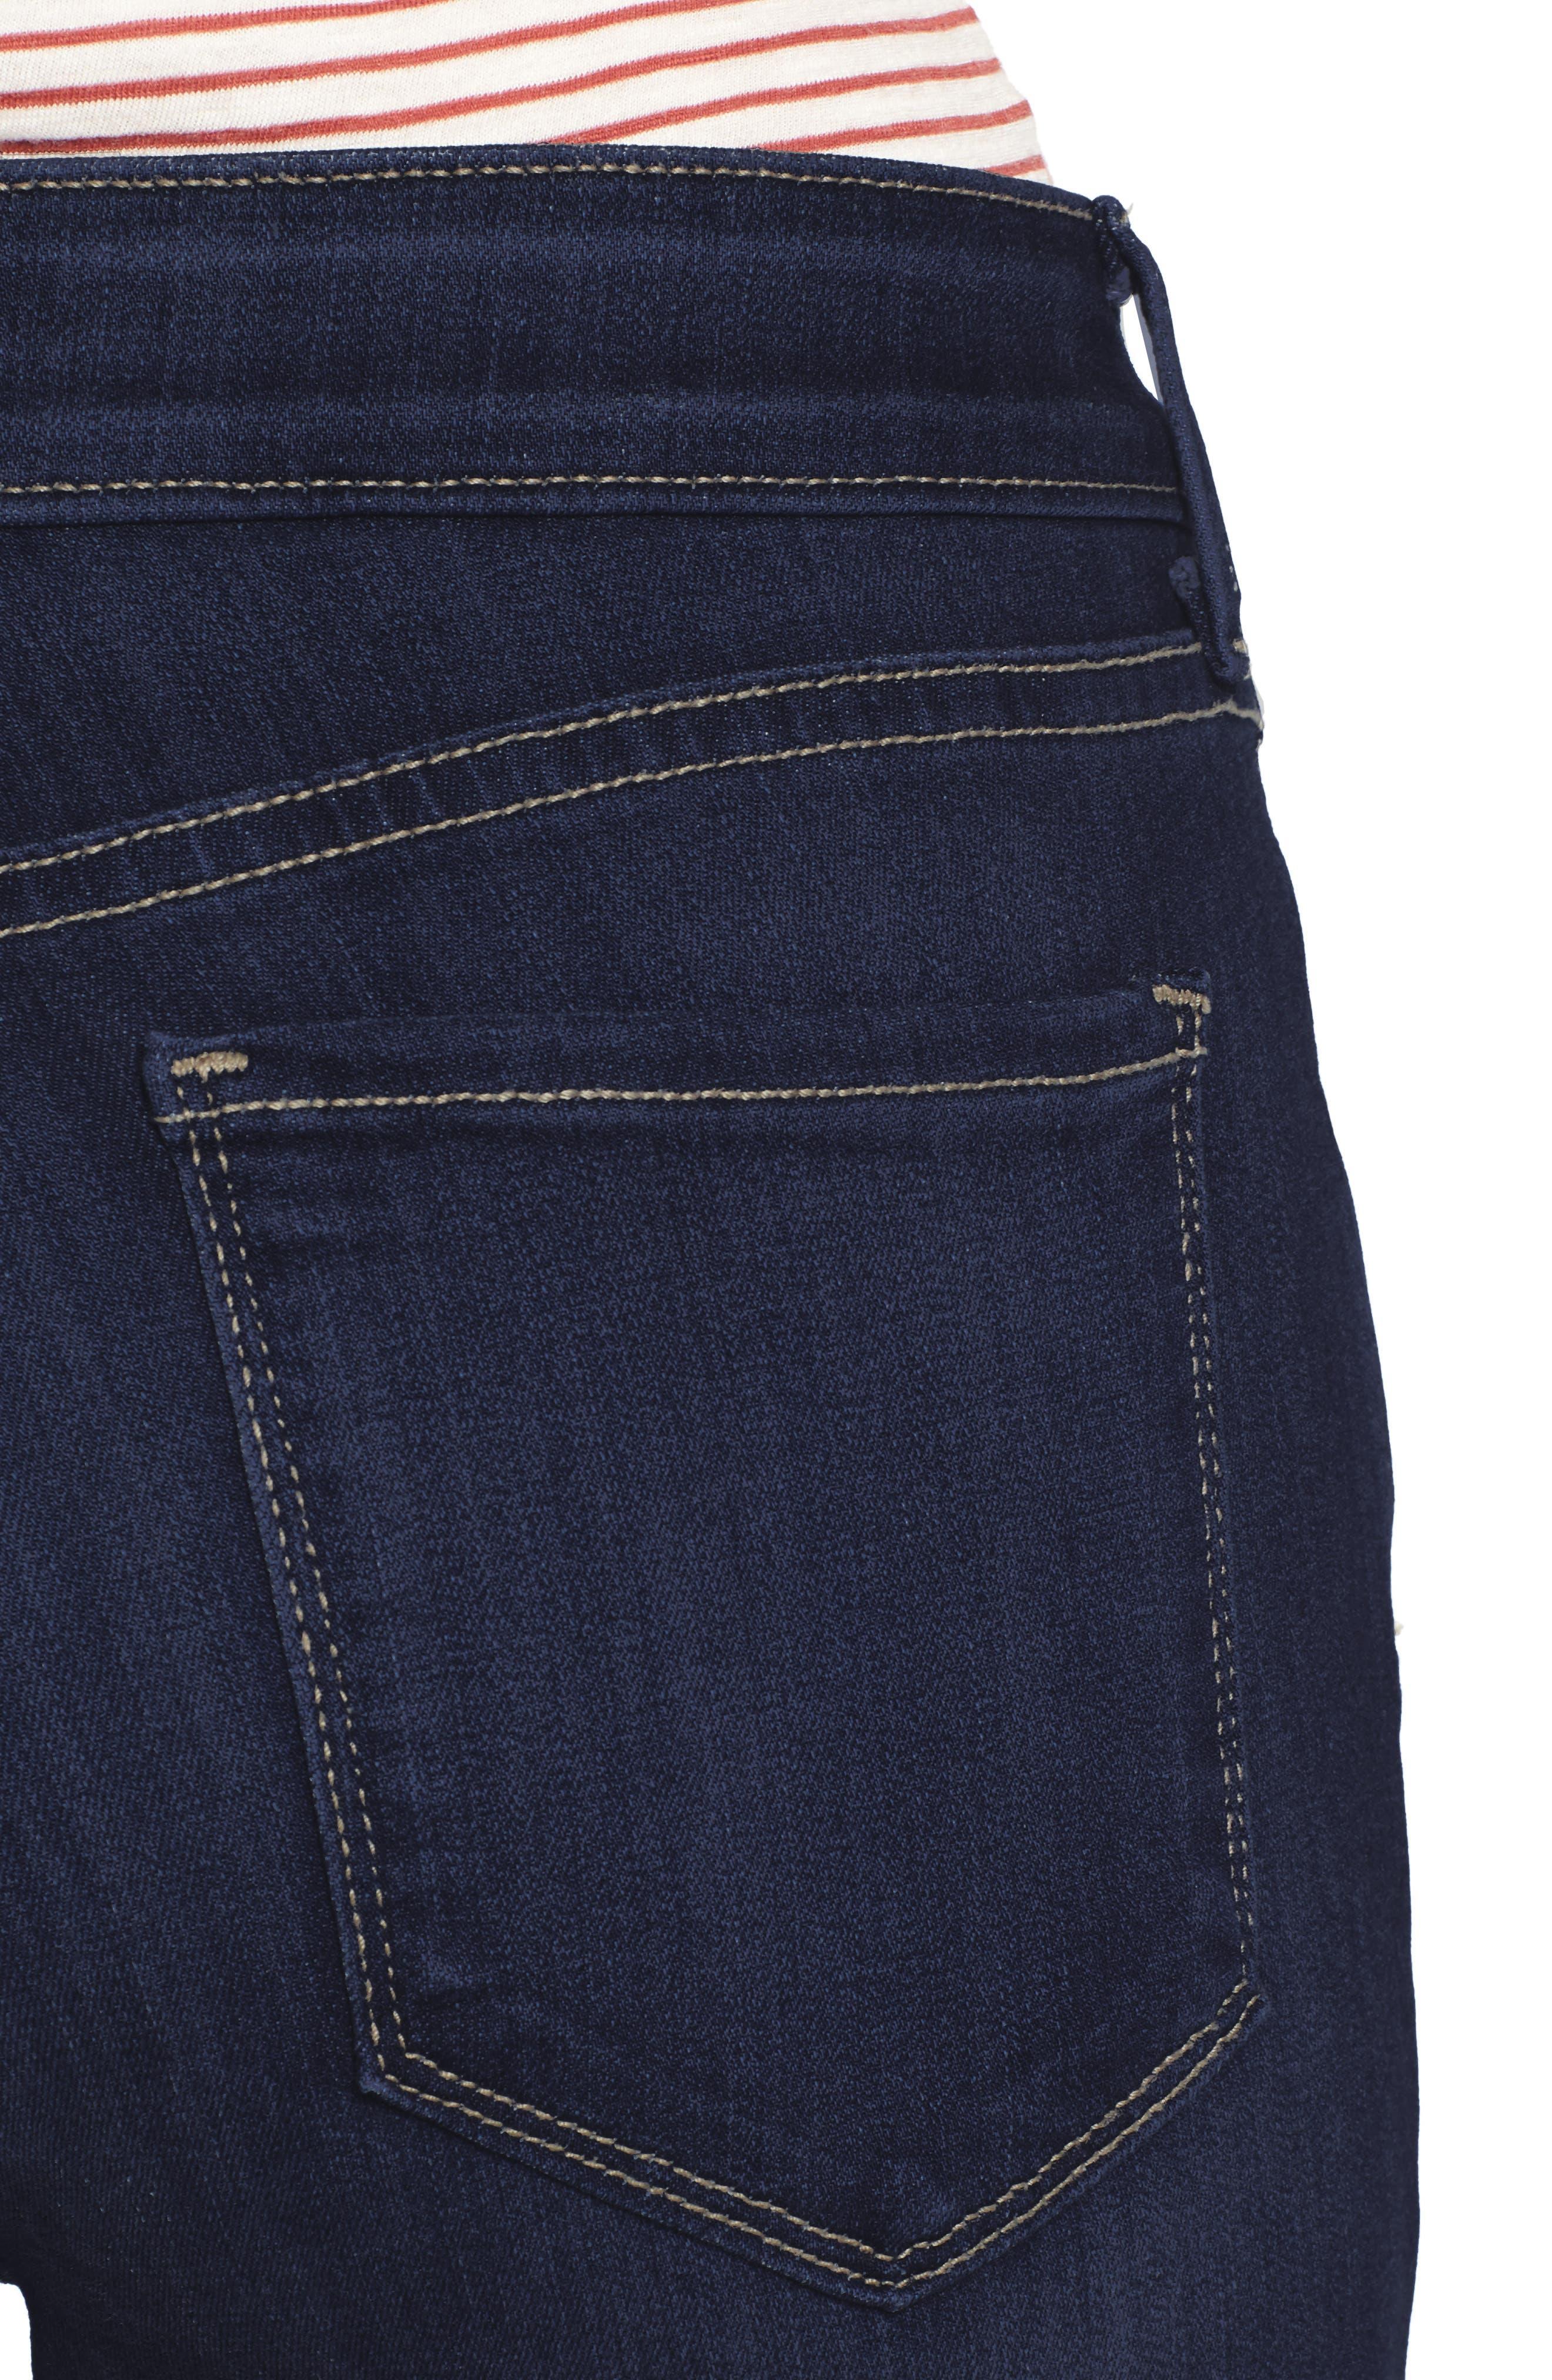 Ami Release Hem Stretch Skinny Jeans,                             Alternate thumbnail 4, color,                             464